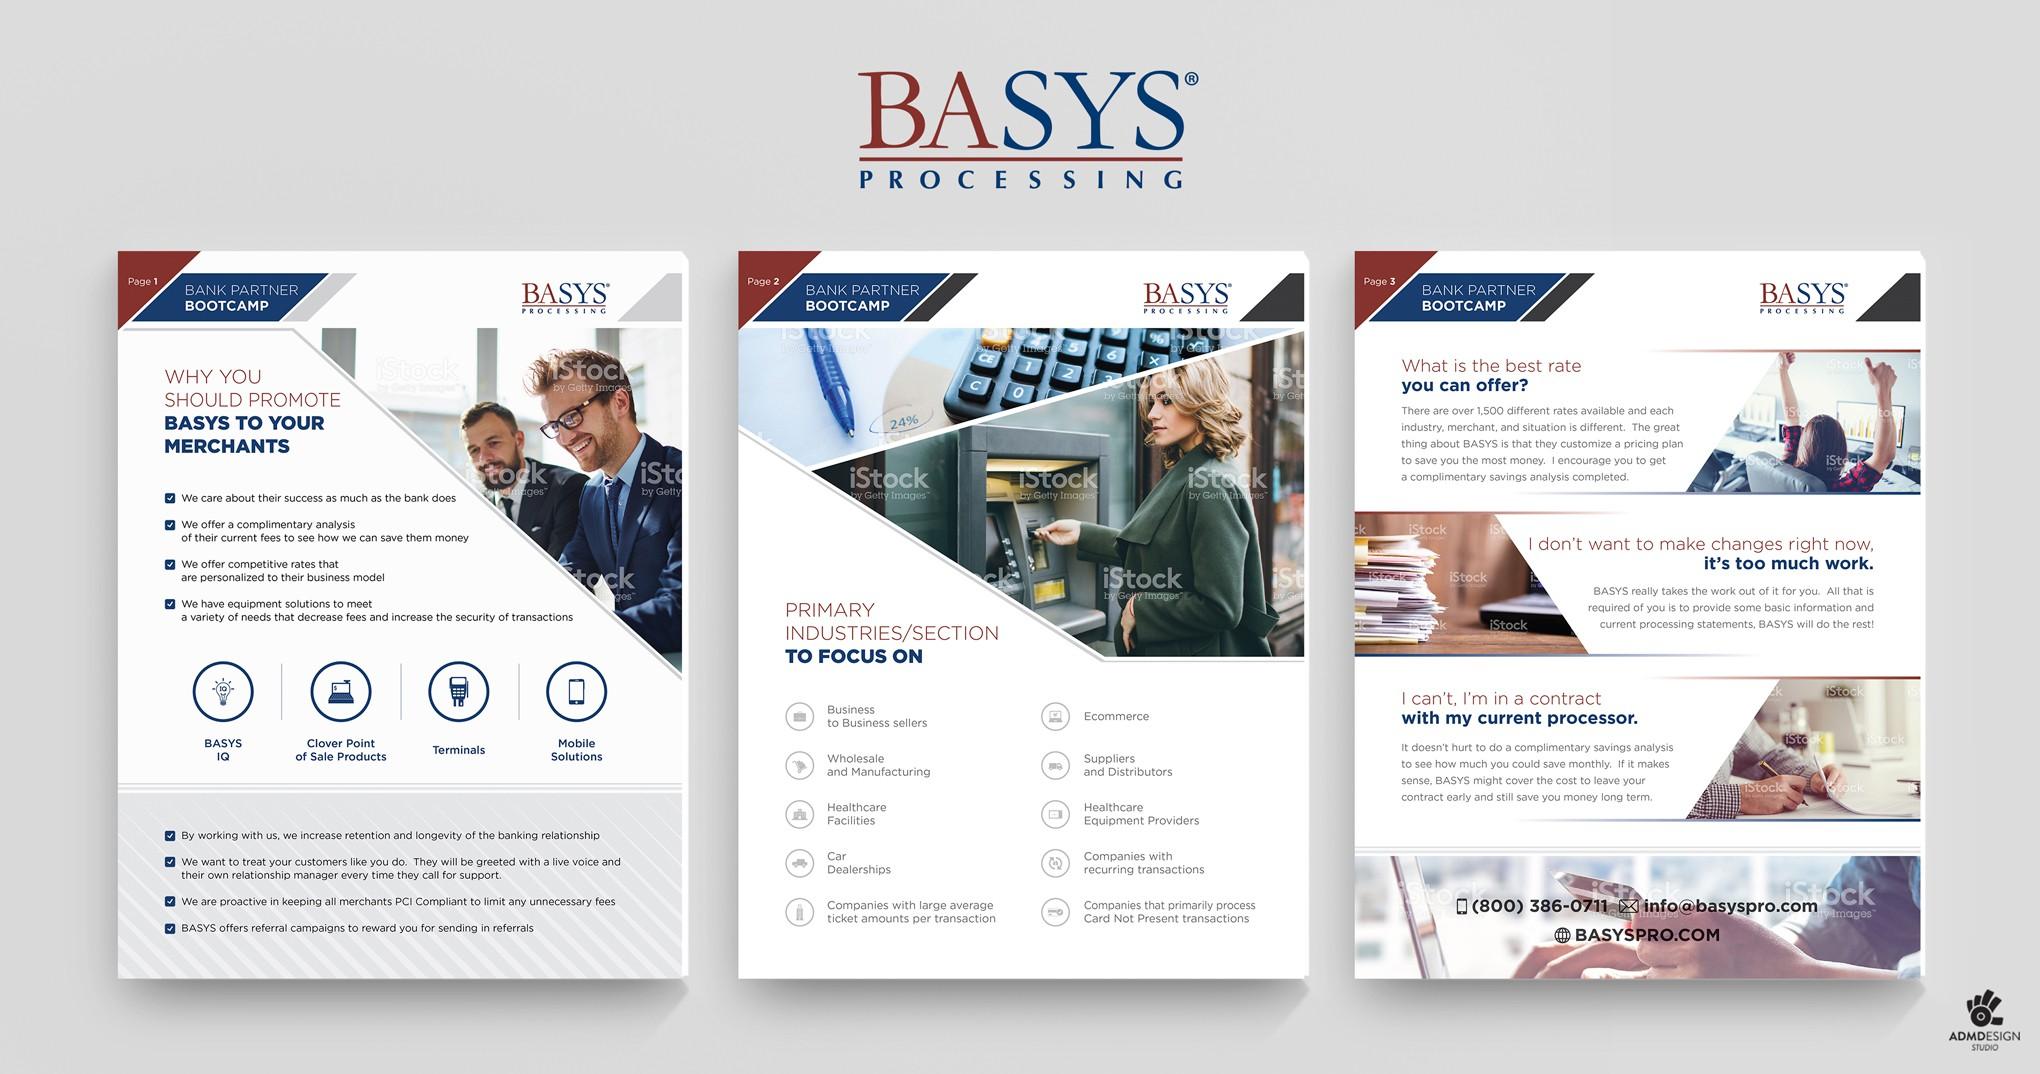 Bank Partner Bootcamp flyer